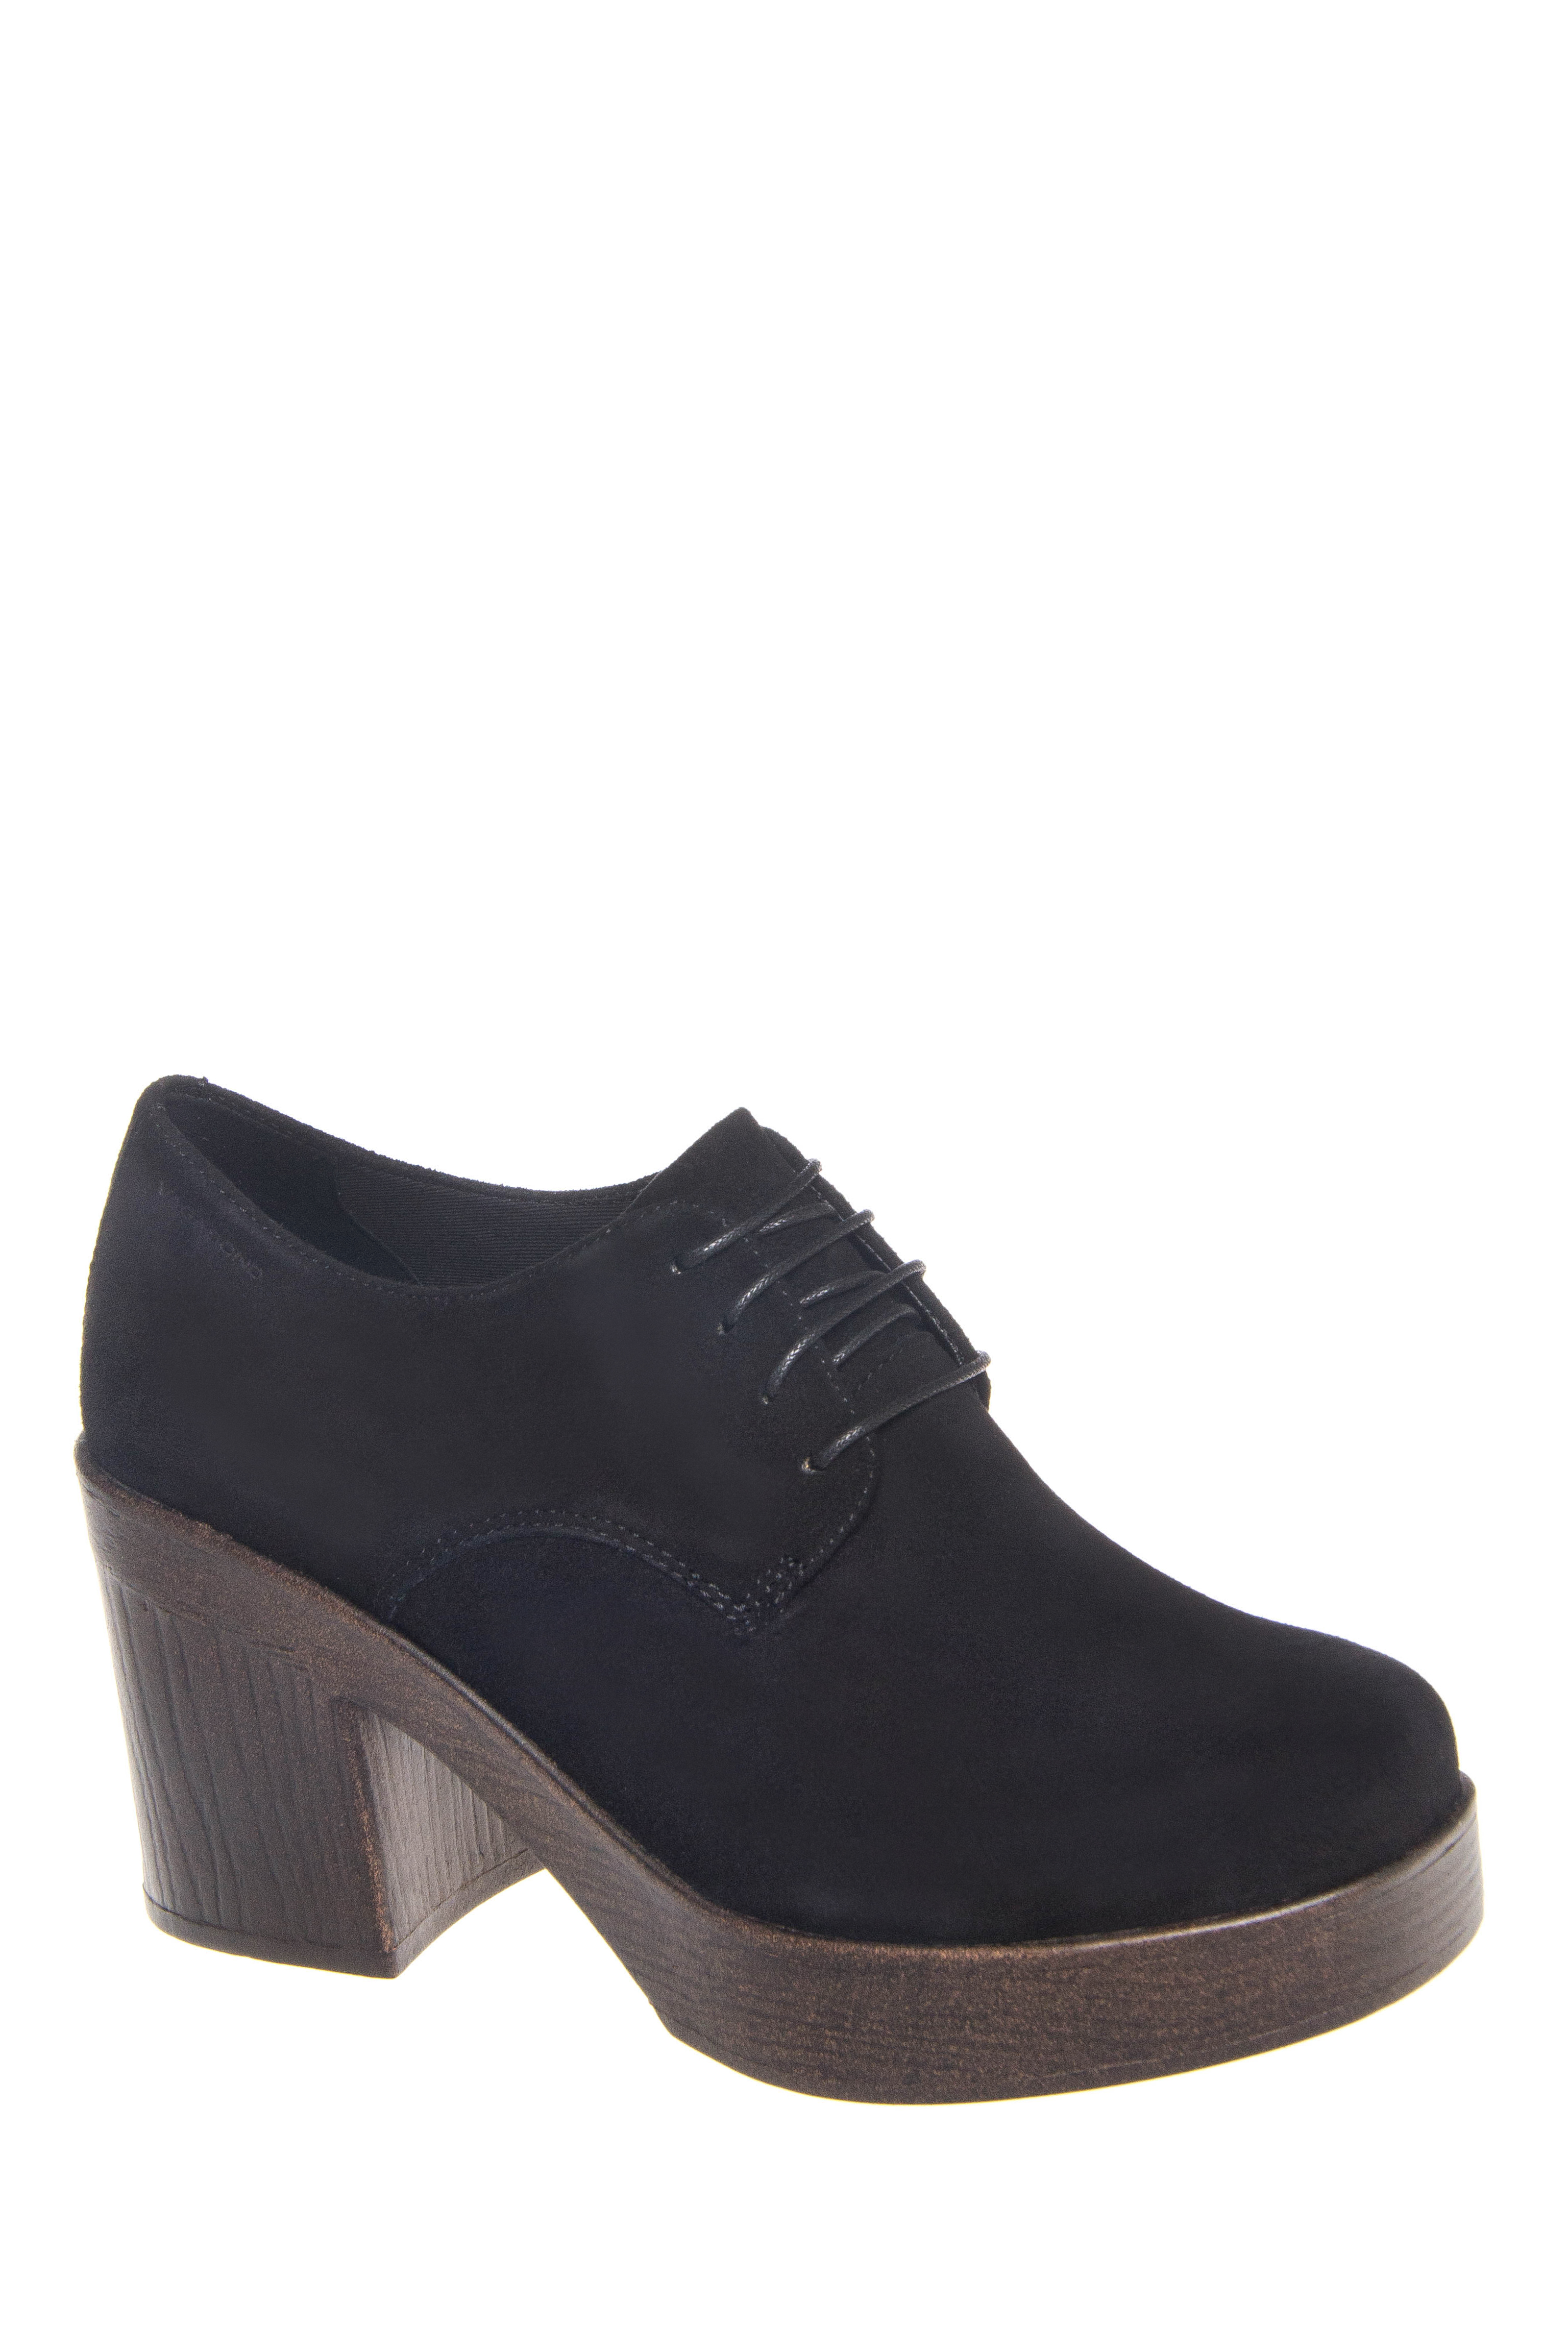 Vagabond Marva Lace Up Mid Heel Platform Booties - Black